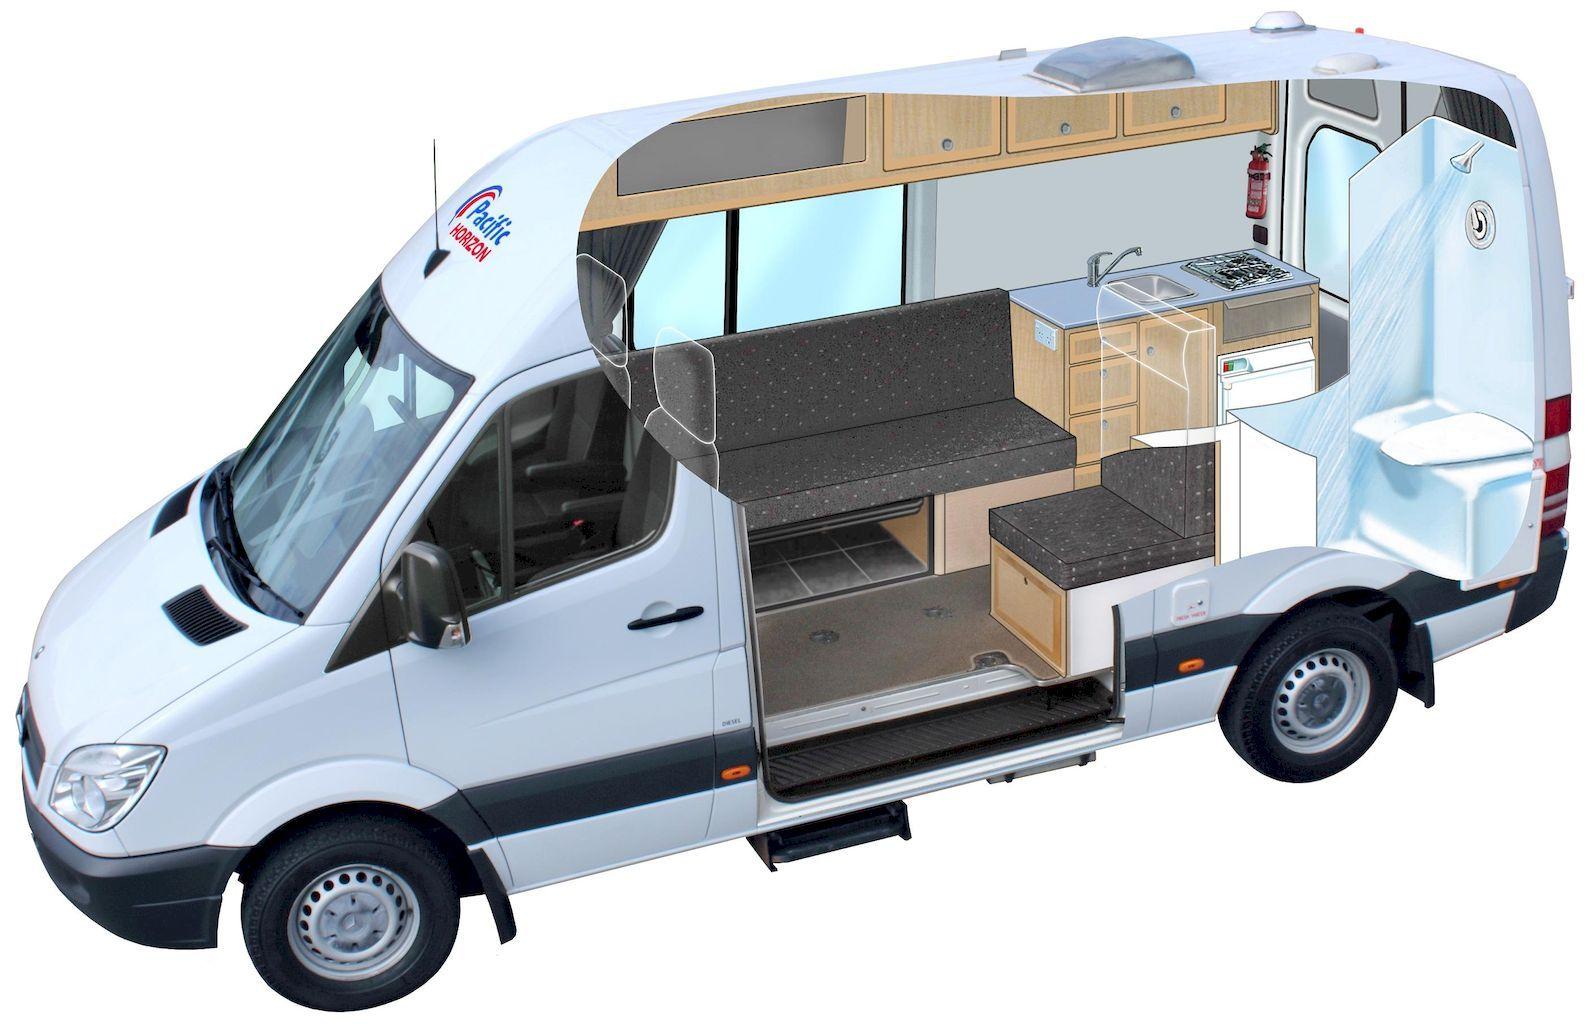 40 Smart Low Budget RVs Van Conversion Ideas